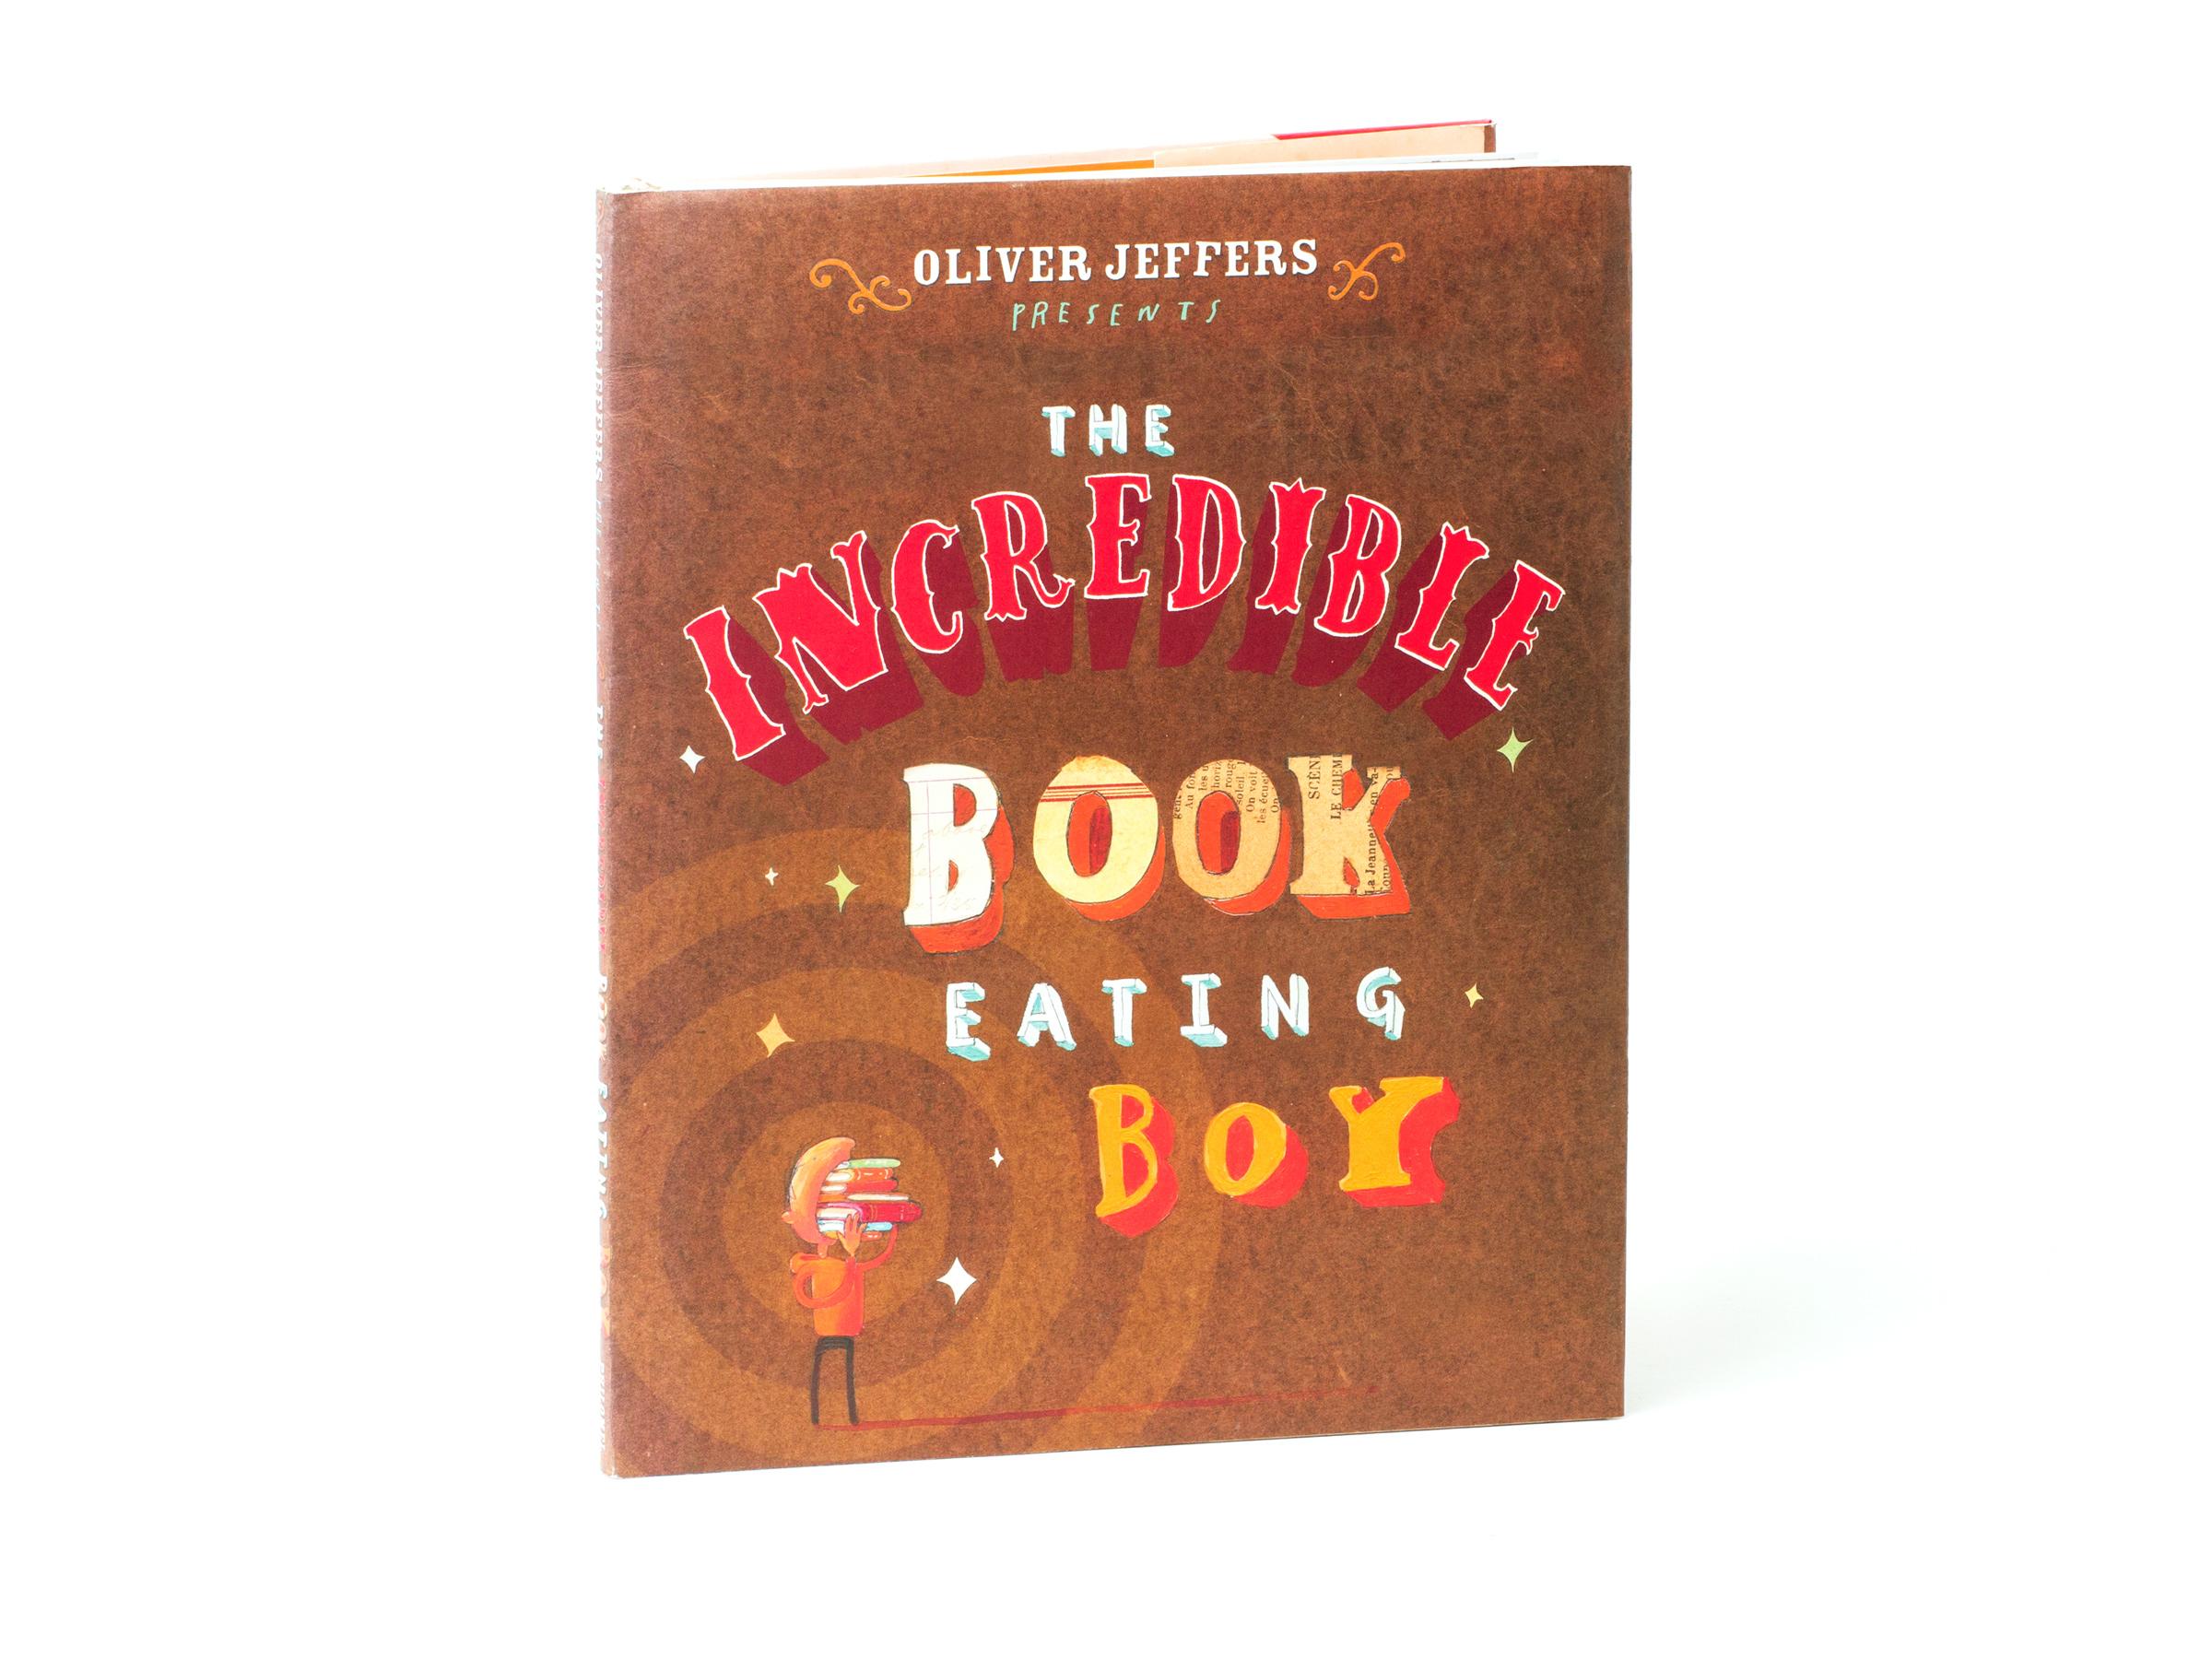 BOOK-EATING-BOY2.jpg